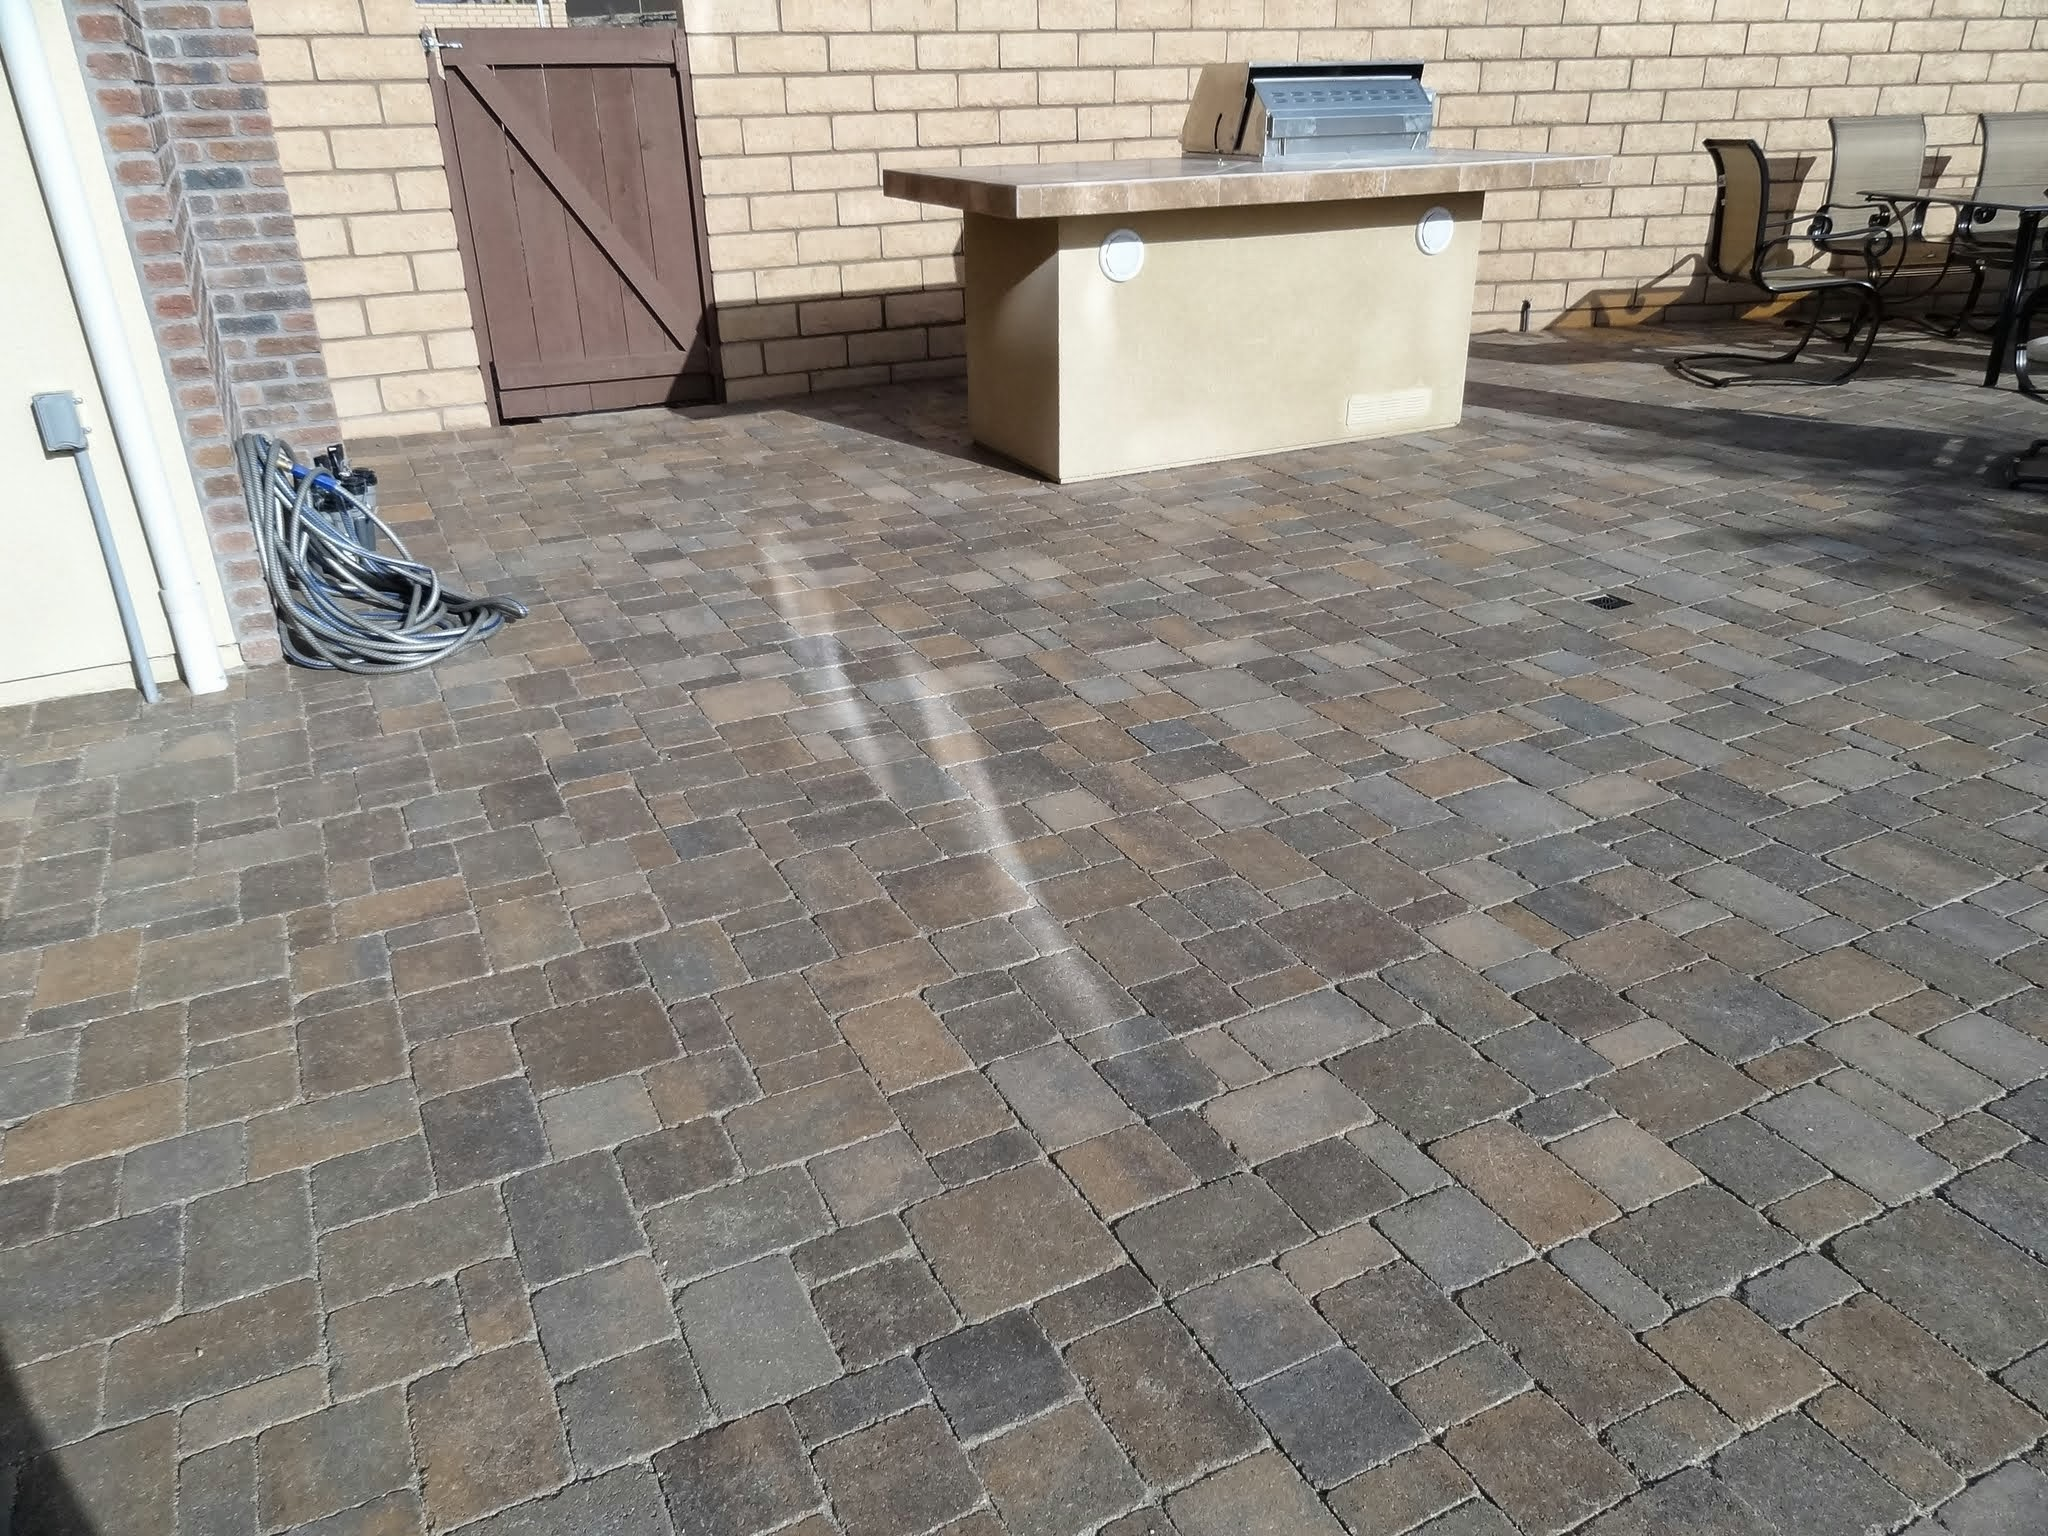 Energy Efficient Windows reflection on paving stones